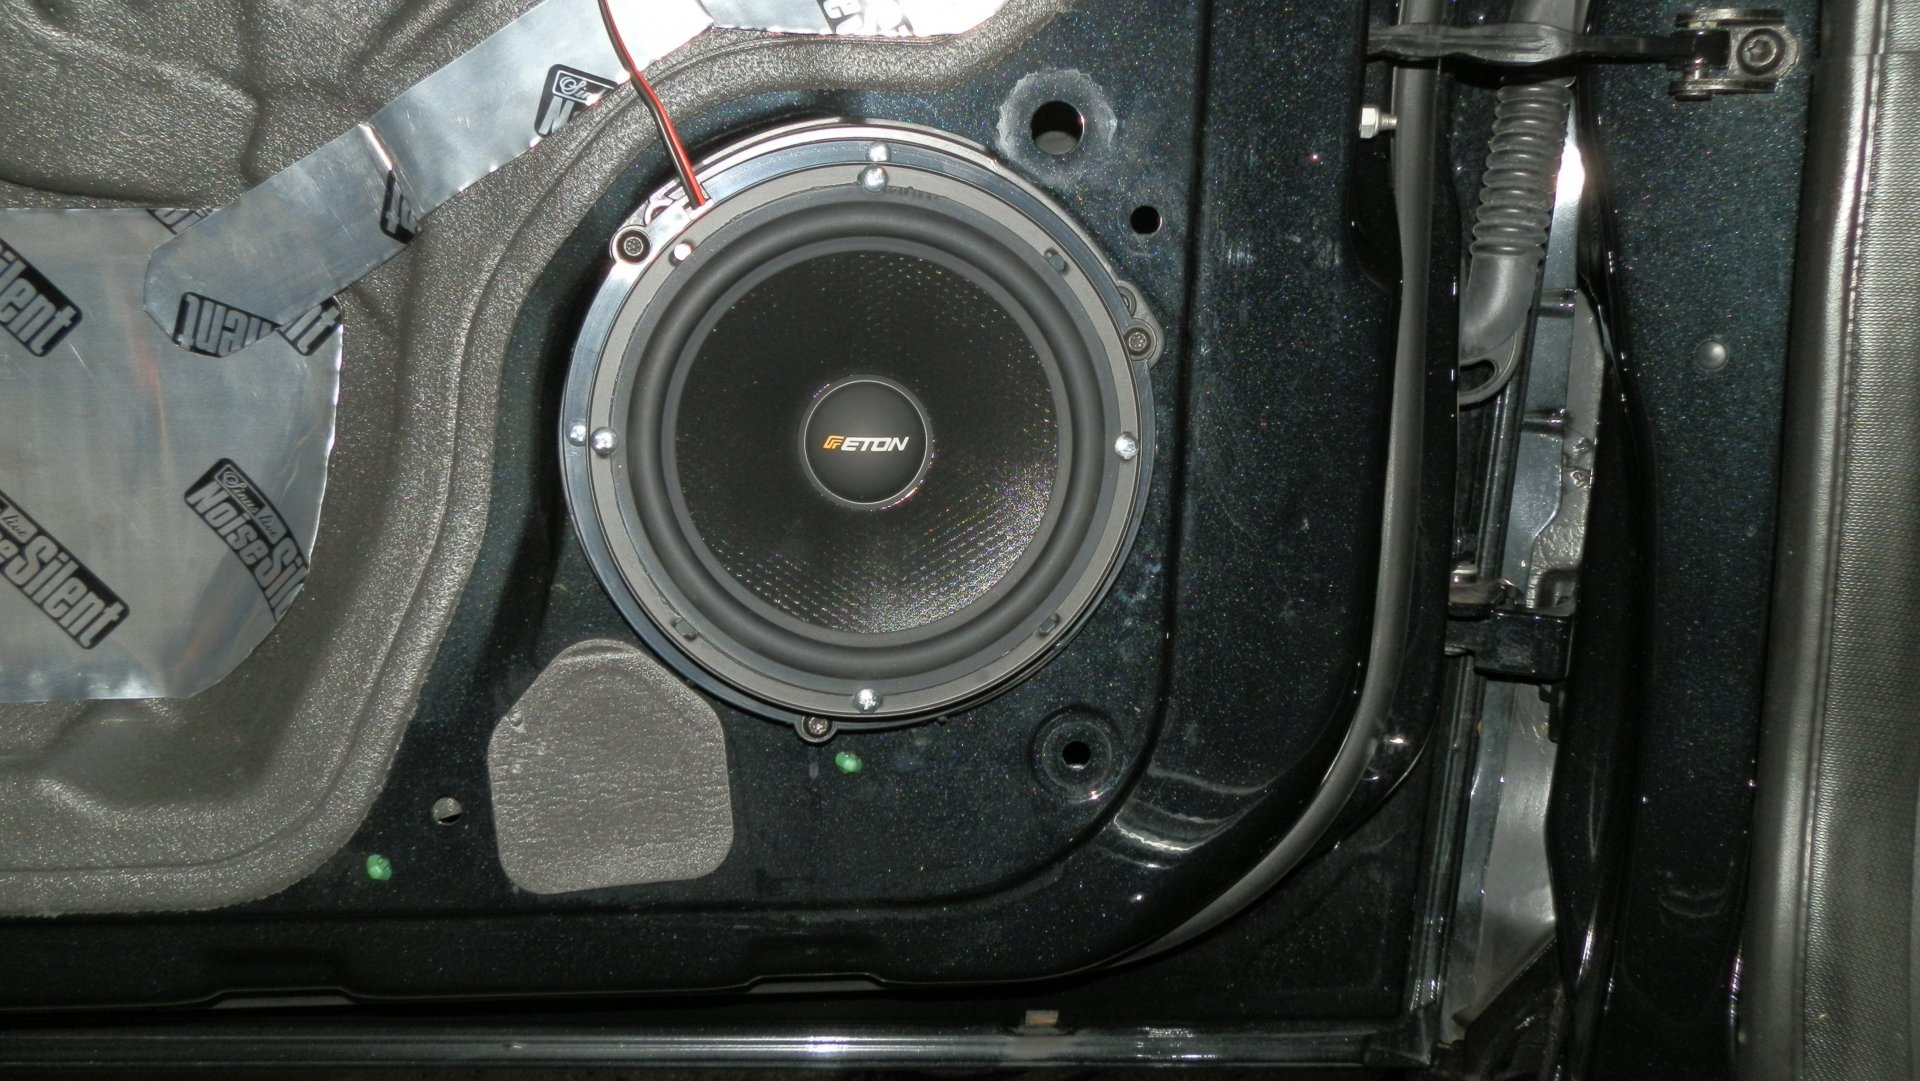 Ford Focus III (2016-07-15) - ETON-Basslautsprecher in Fahrertür.JPG